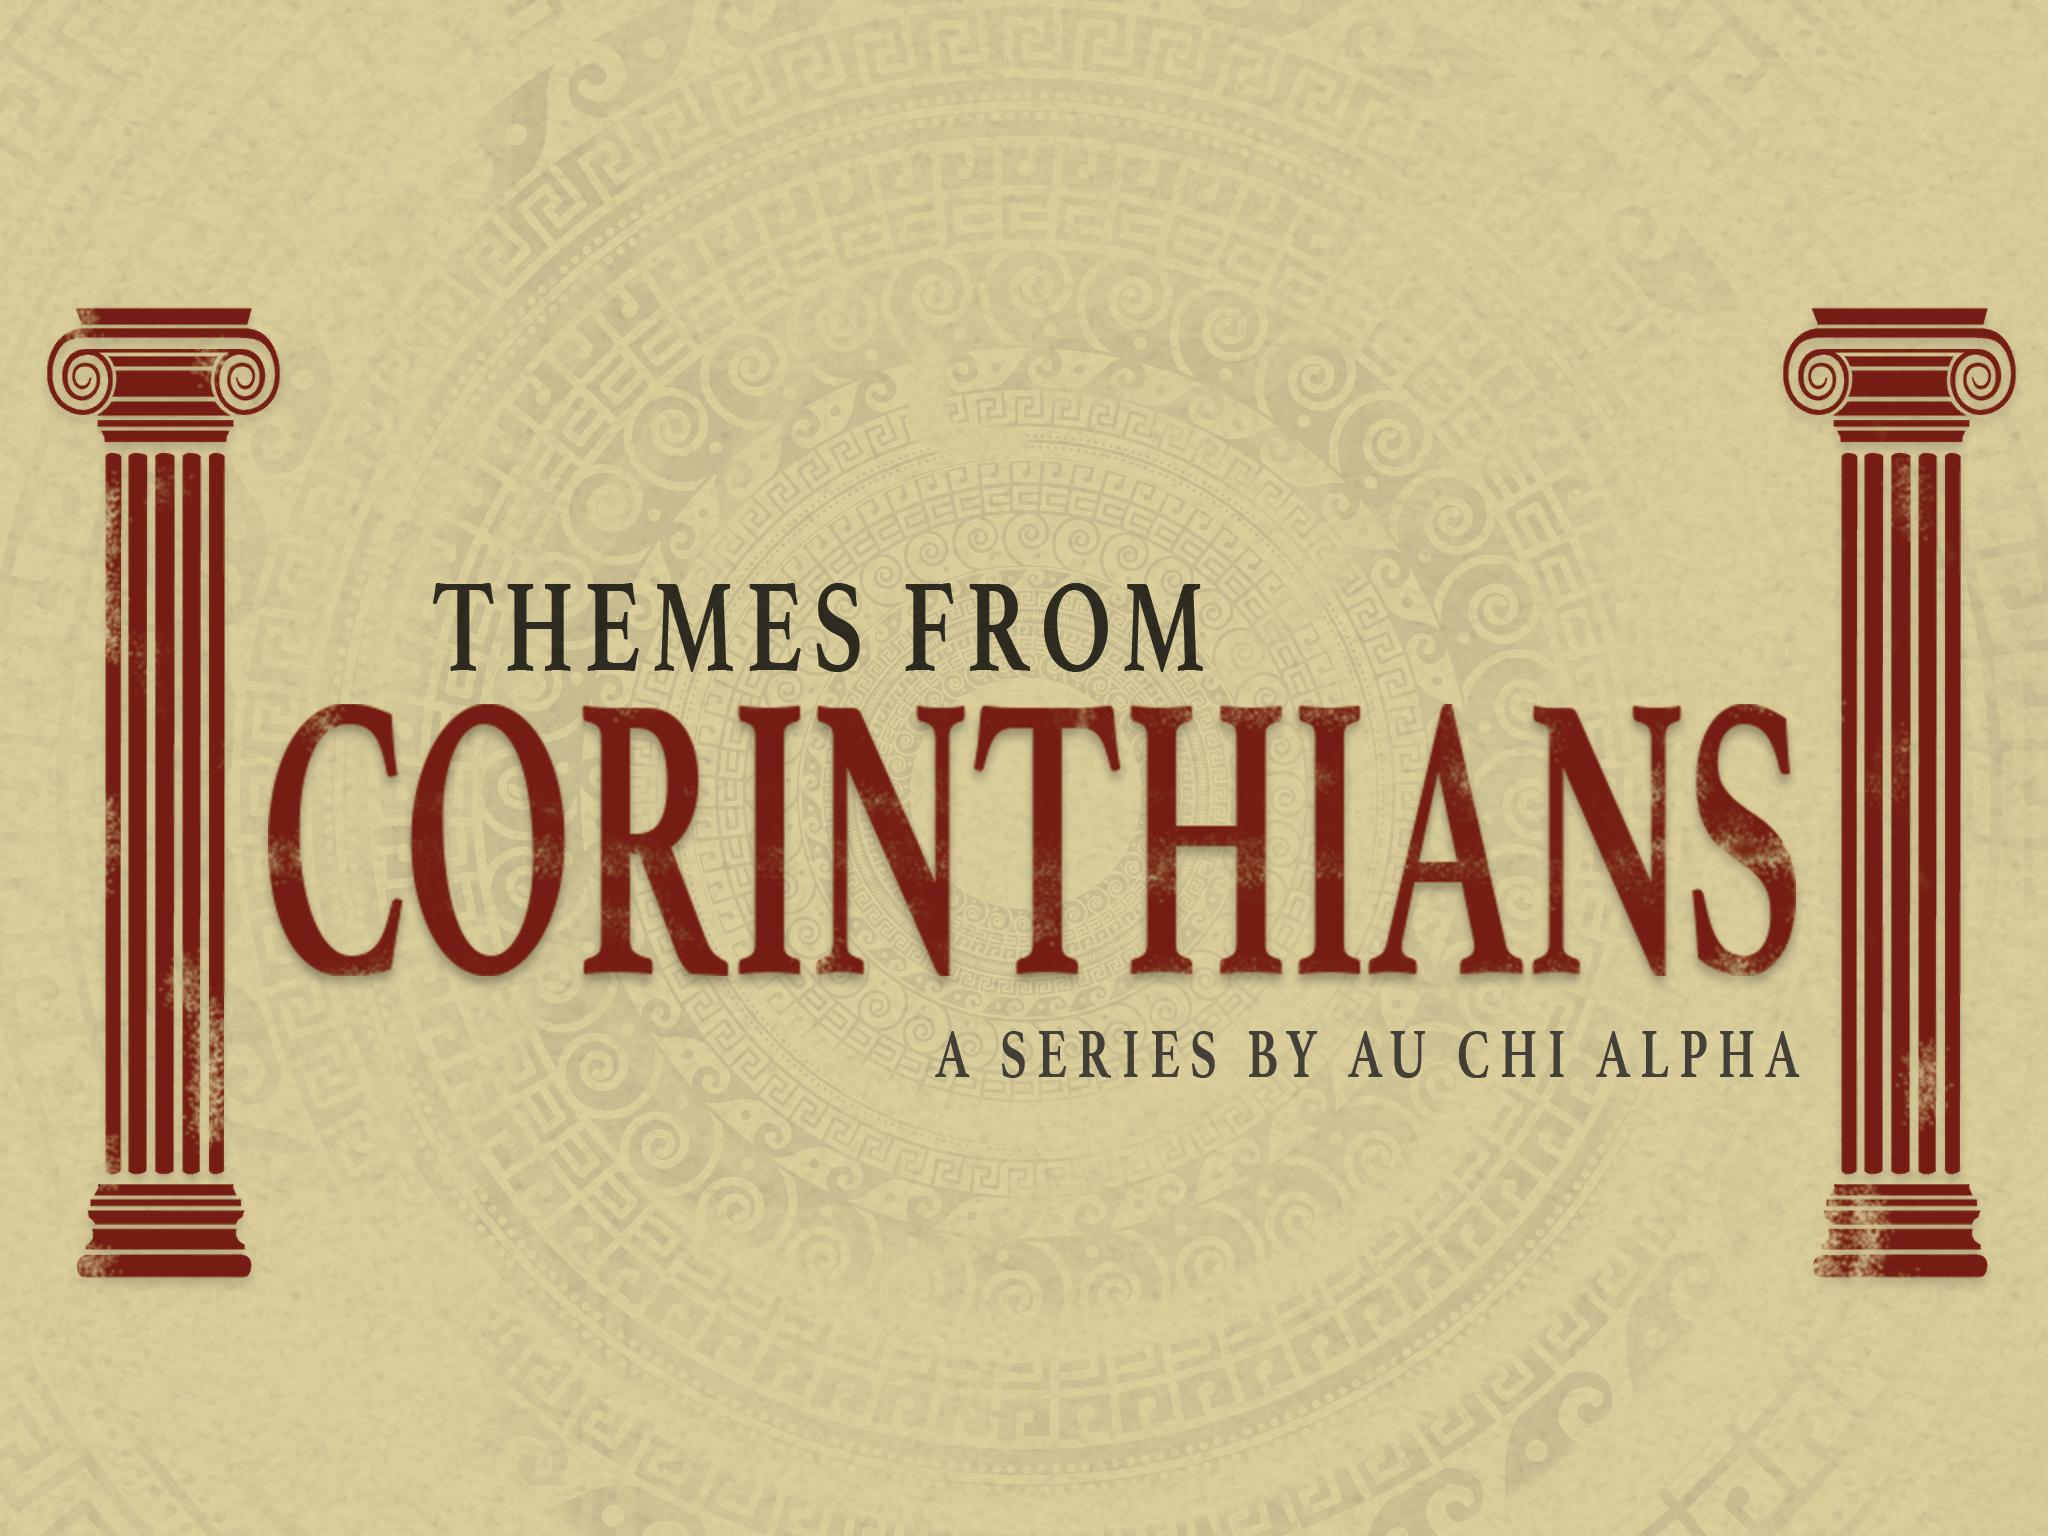 Corinthians v1.jpg